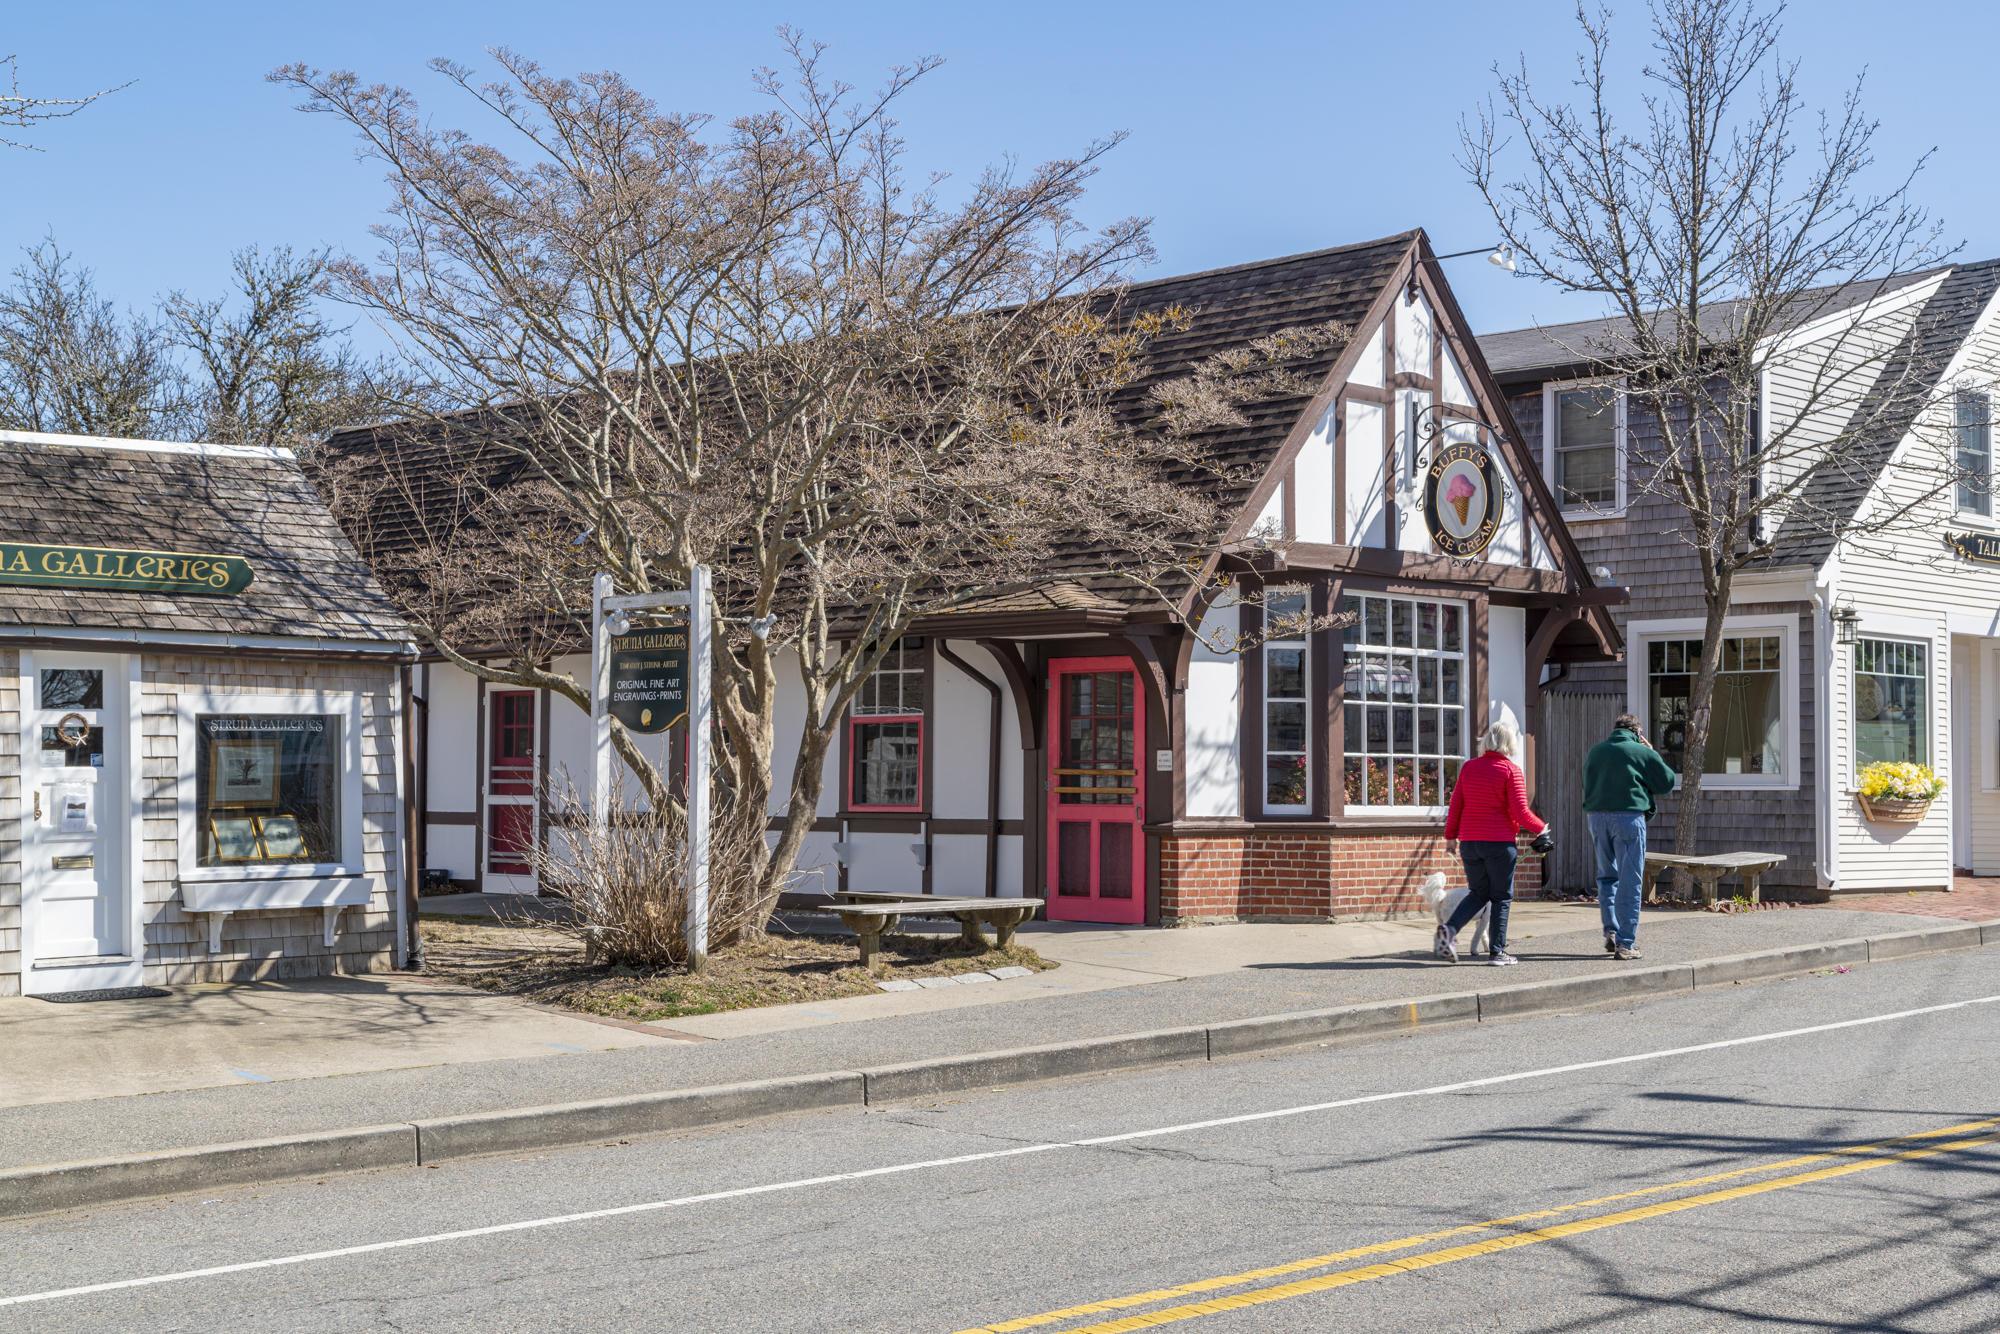 456 Main Street, Chatham, MA  02633 - slide 2